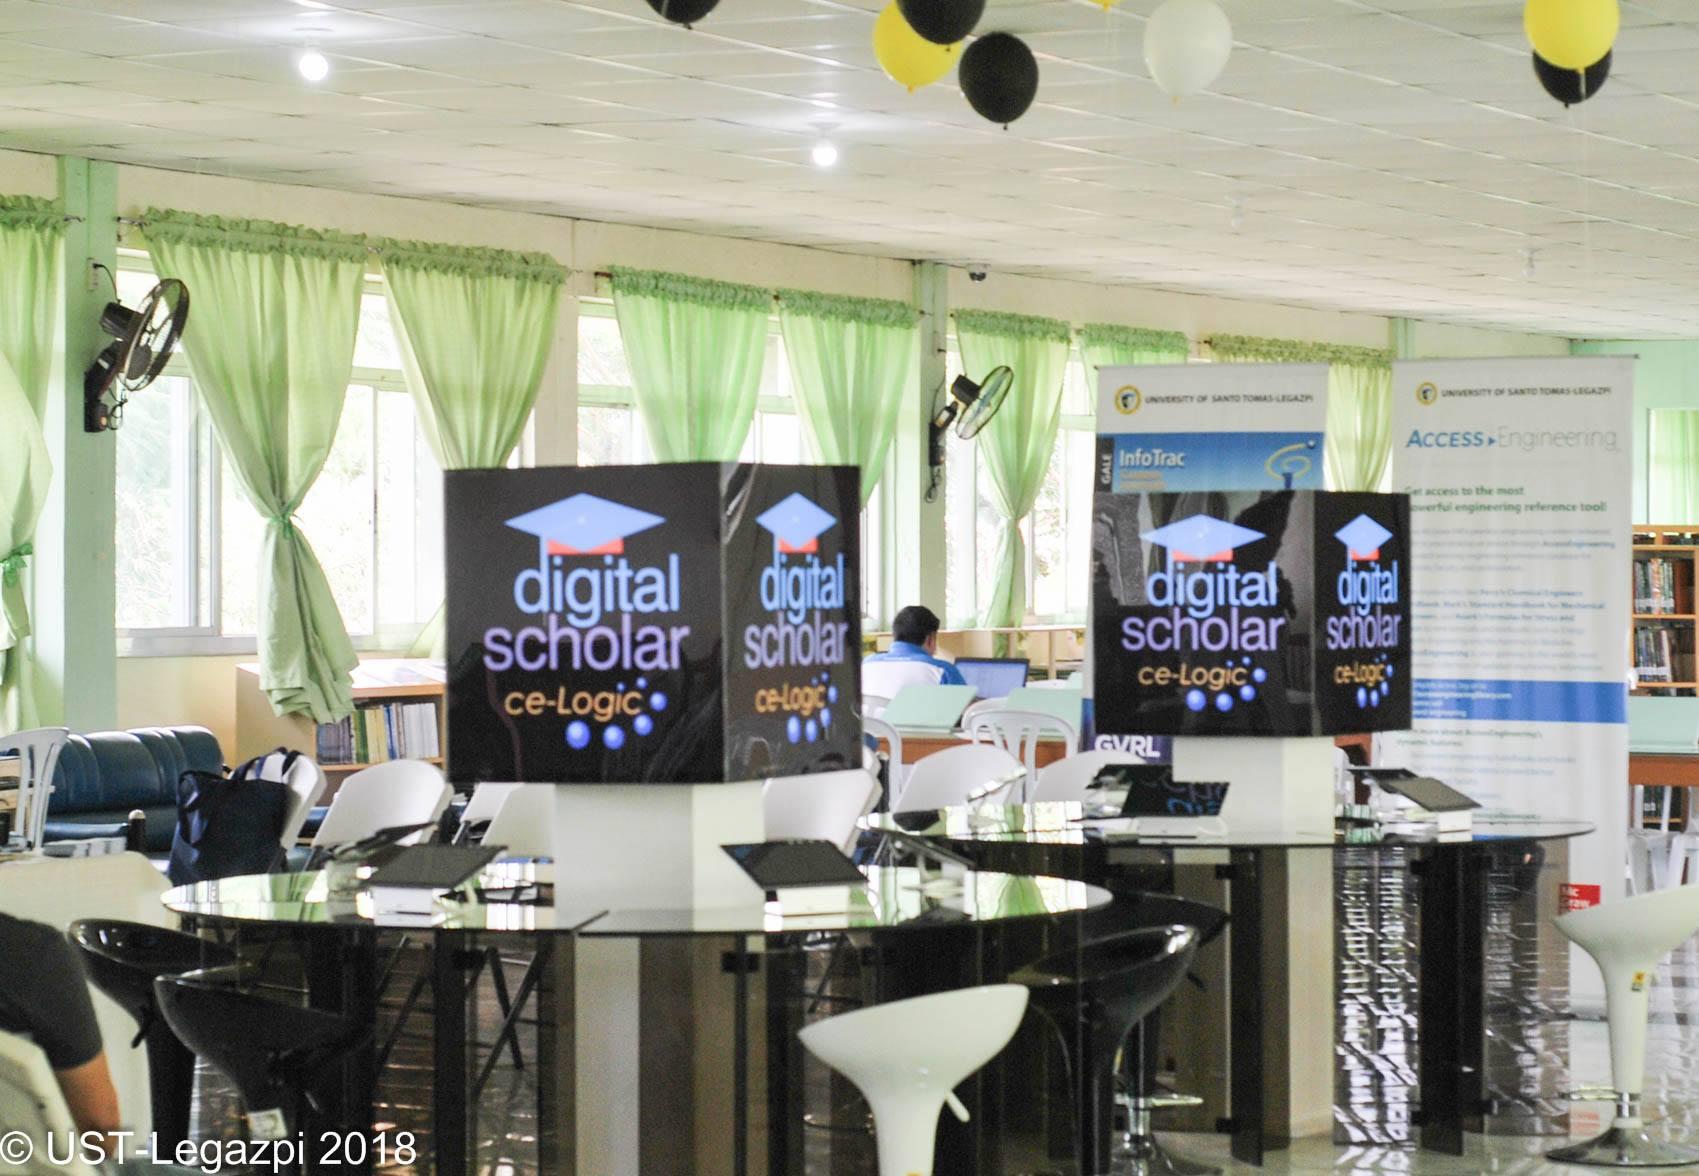 Grand Launching of the Digital Scholar